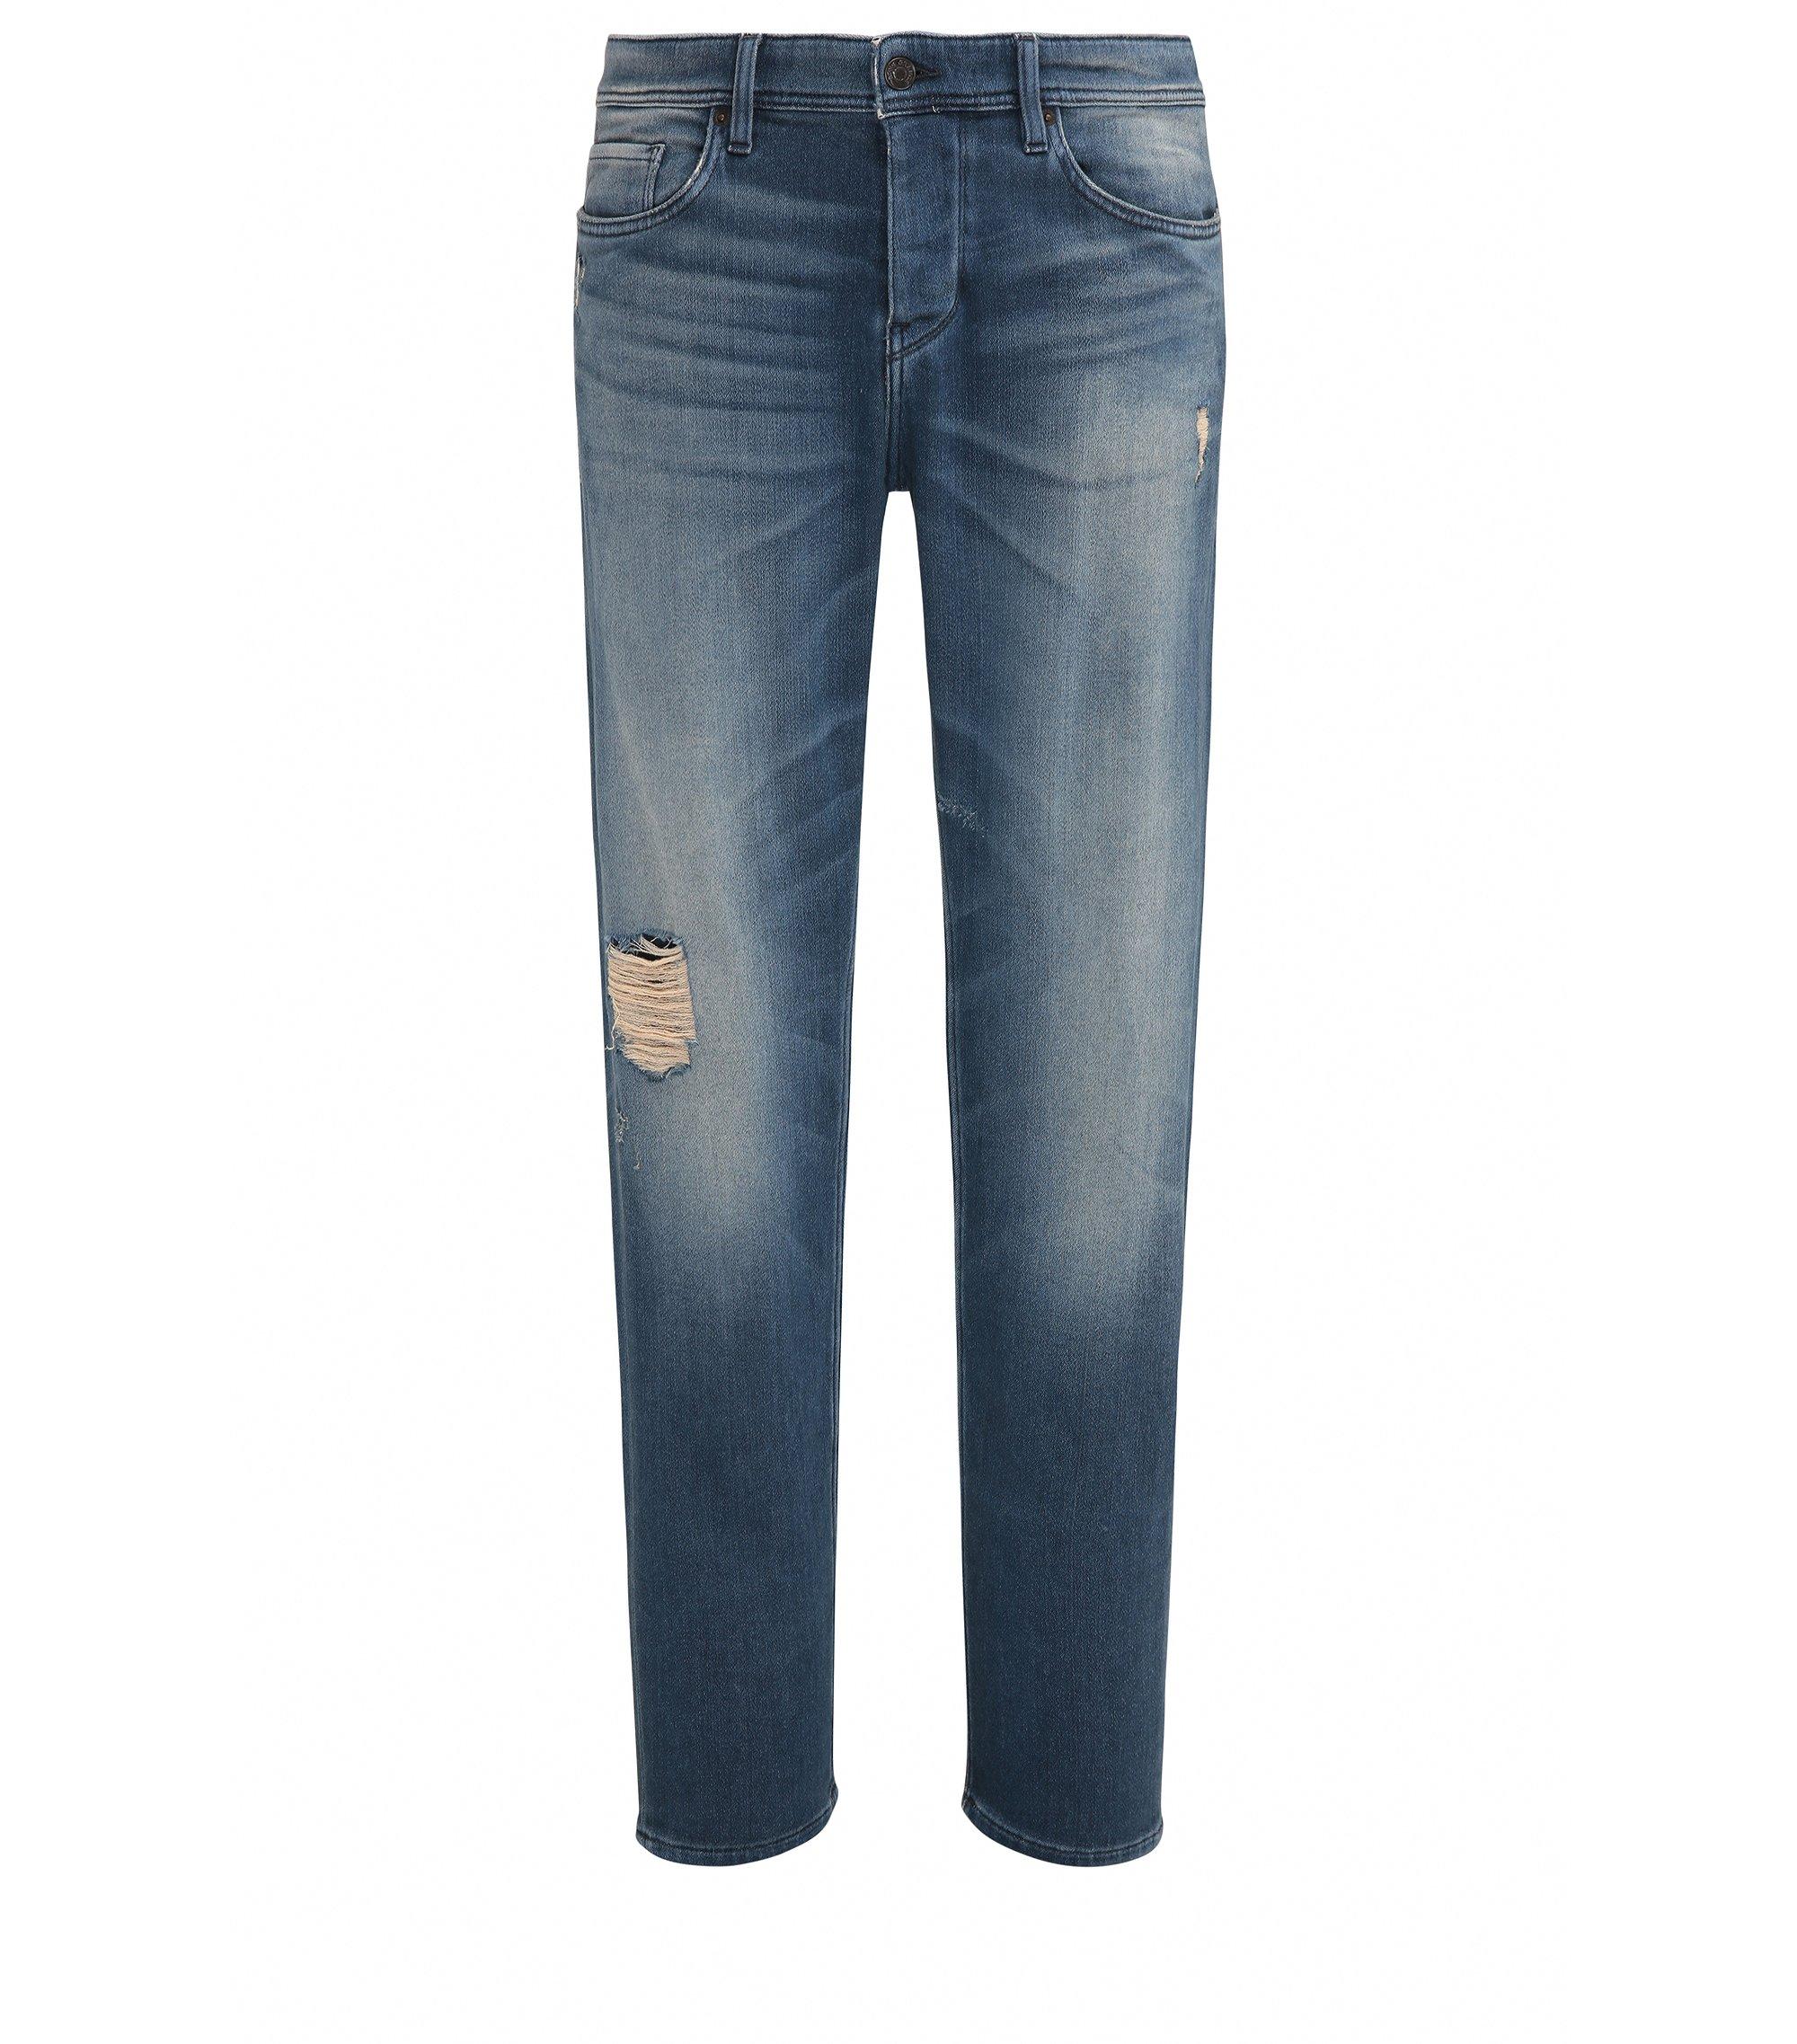 Jeans Tapered Fit en coton stretch confortable, Bleu